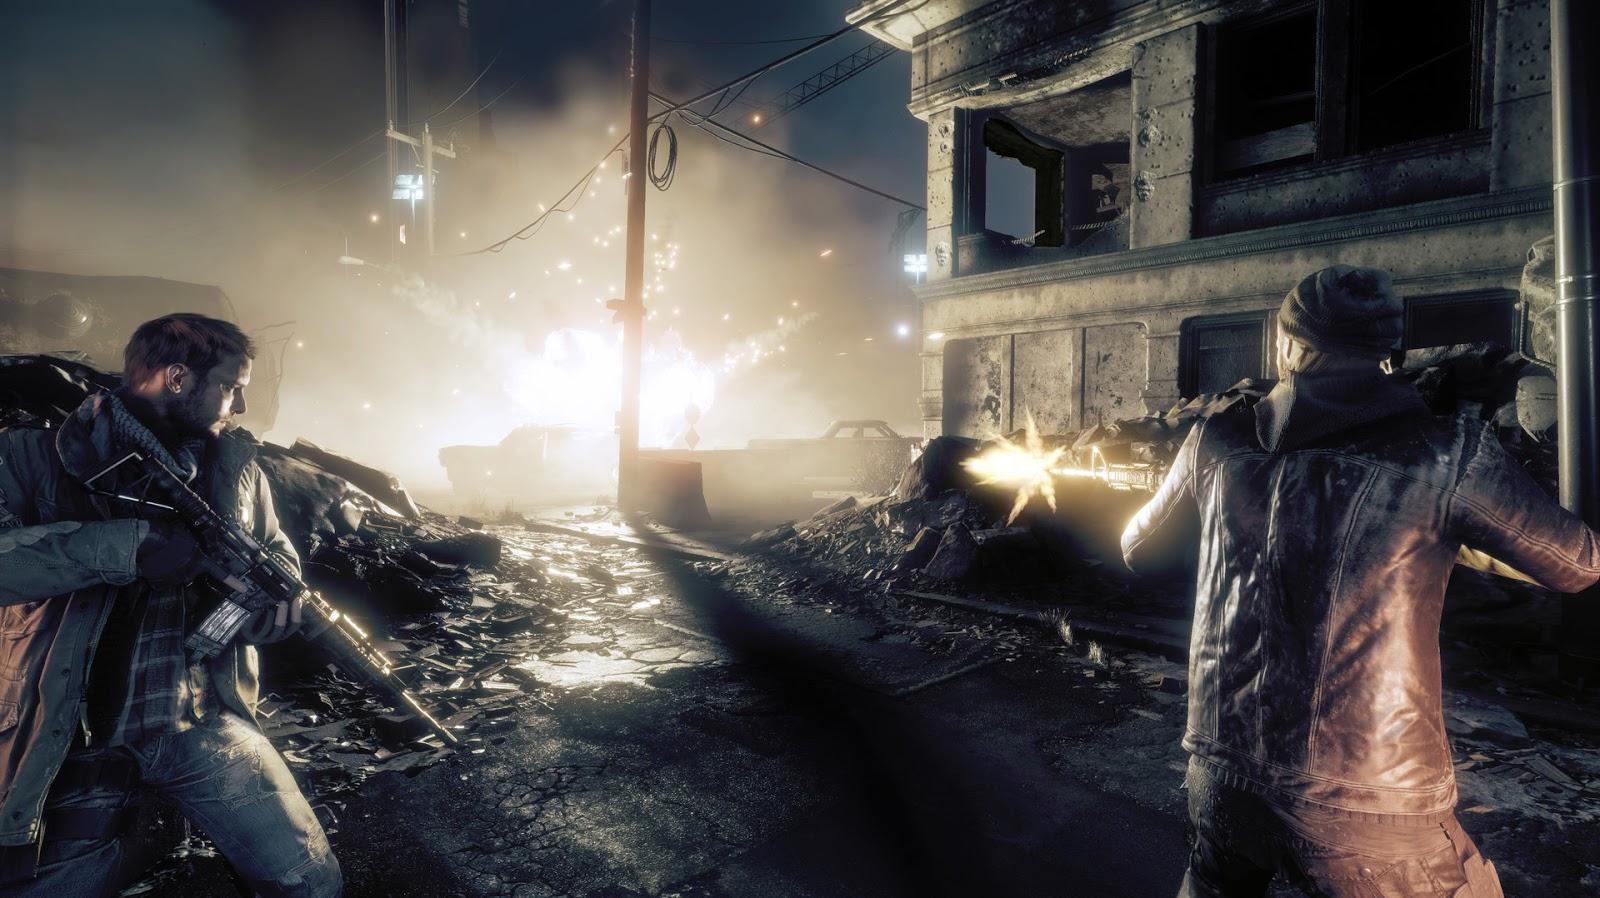 Homefront The Revolution ESPAÑOL PC Descargar Full + Beyond the Walls DLC (PLAZA) + REPACK 9 DVD5 (JPW) 6